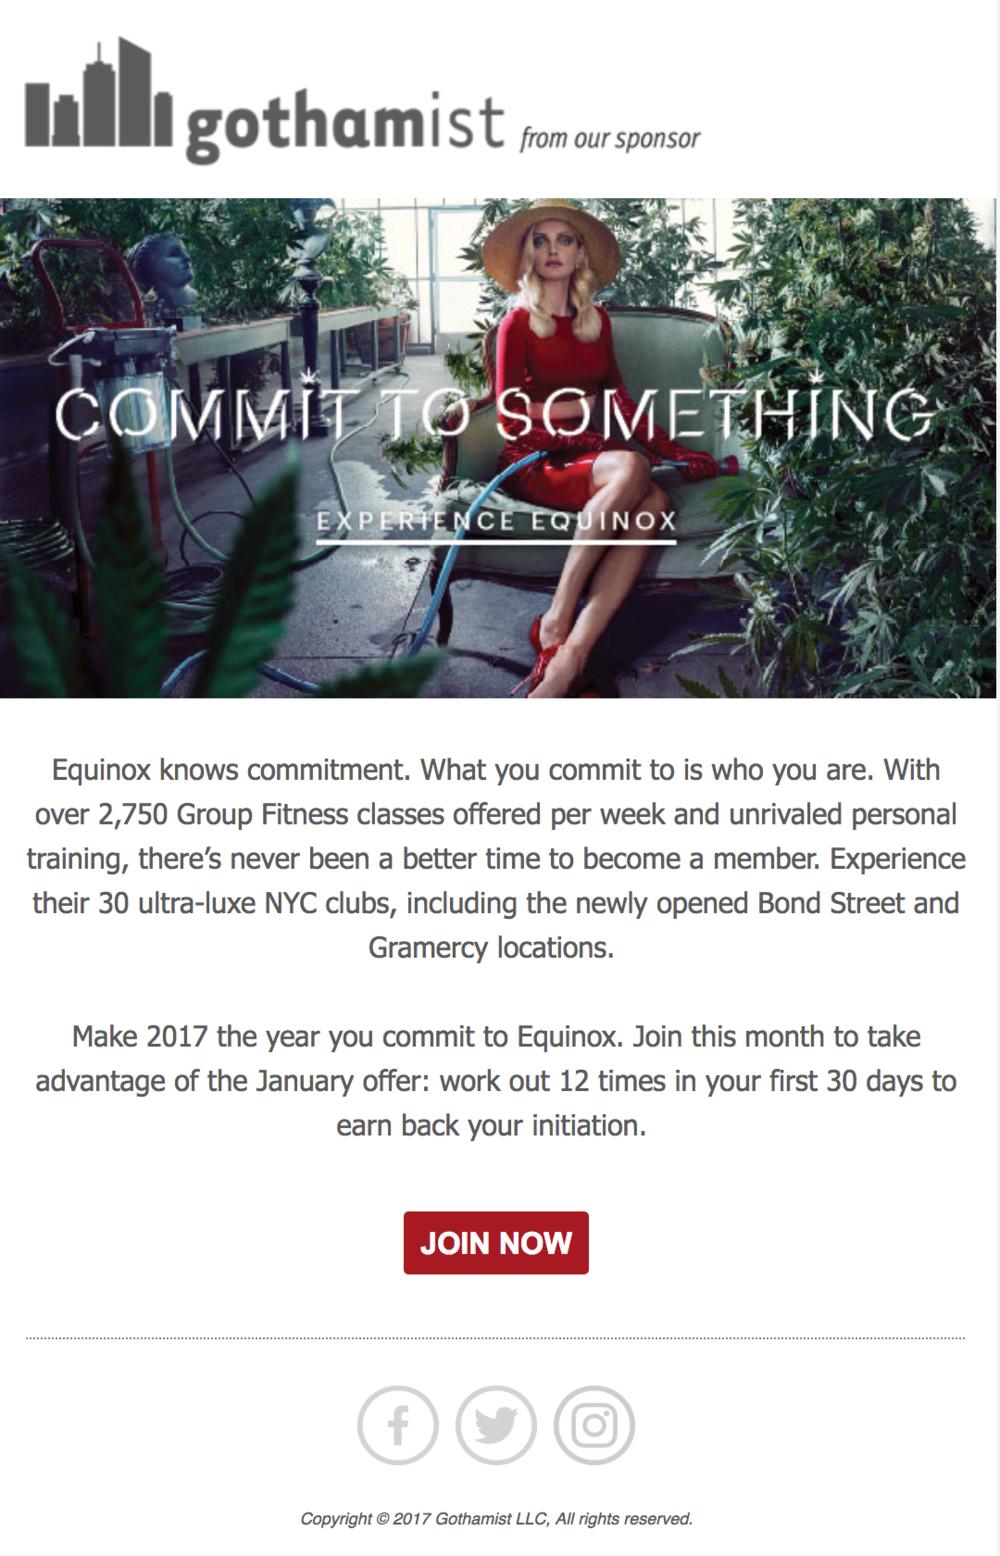 gothamist-equinox-sponsor.png